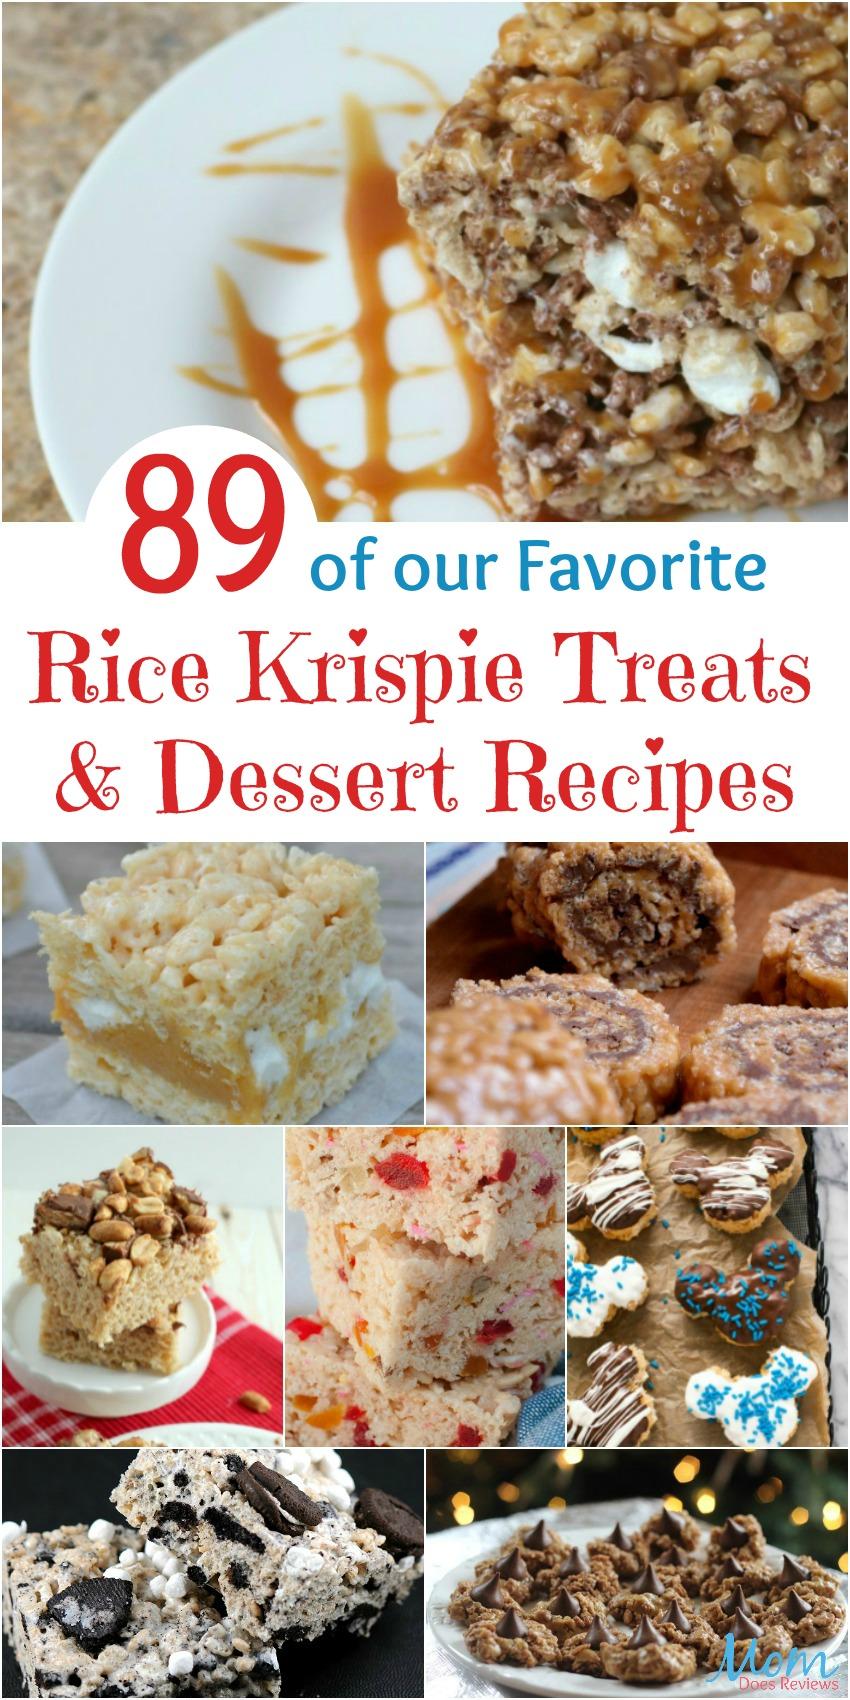 89 of our Favorite Rice Krispie Treats & Dessert #Recipes #desserts #treats #sweets #yummy #ricekrispietreats